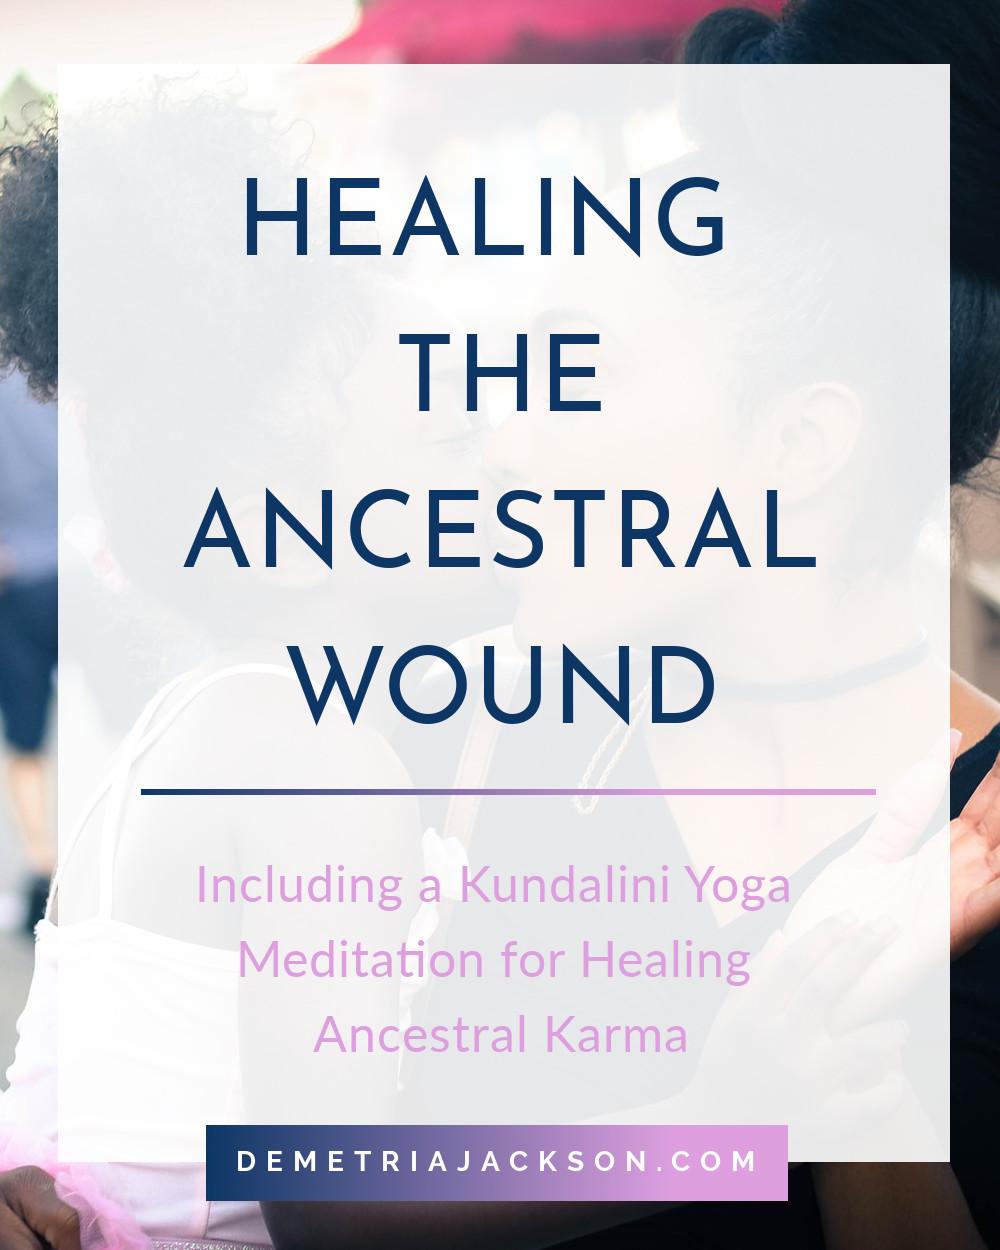 blog-thumbnail-healing-the-ancestral-wound.jpeg